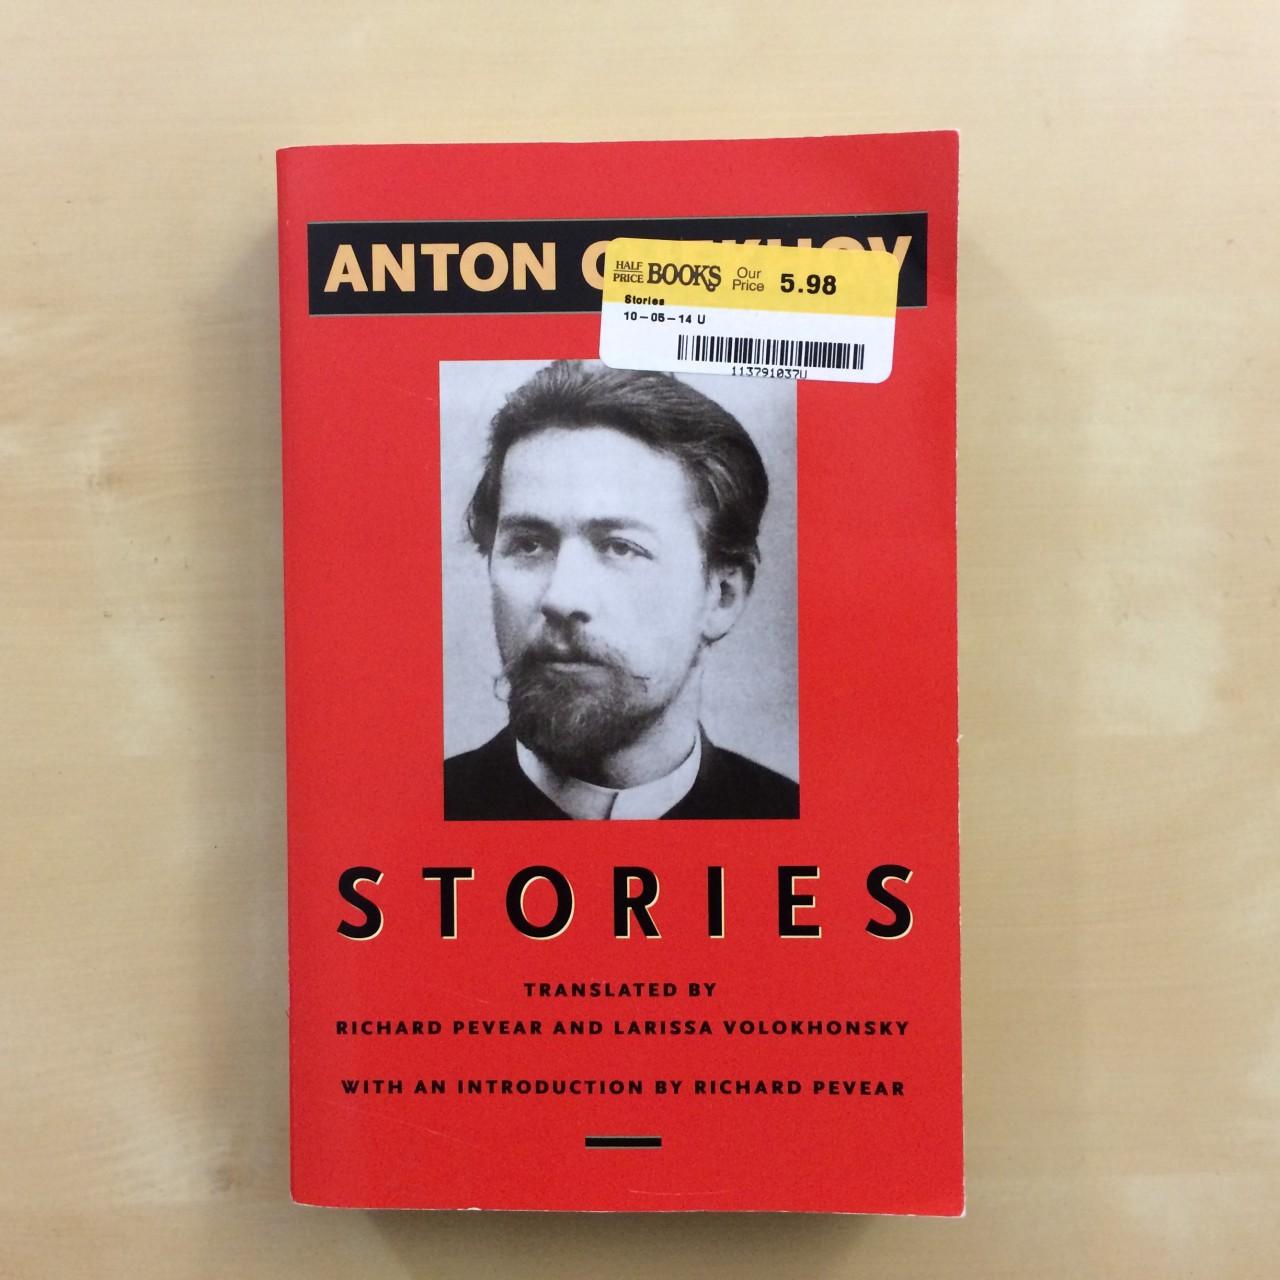 Anton Chekhov Stories used copy